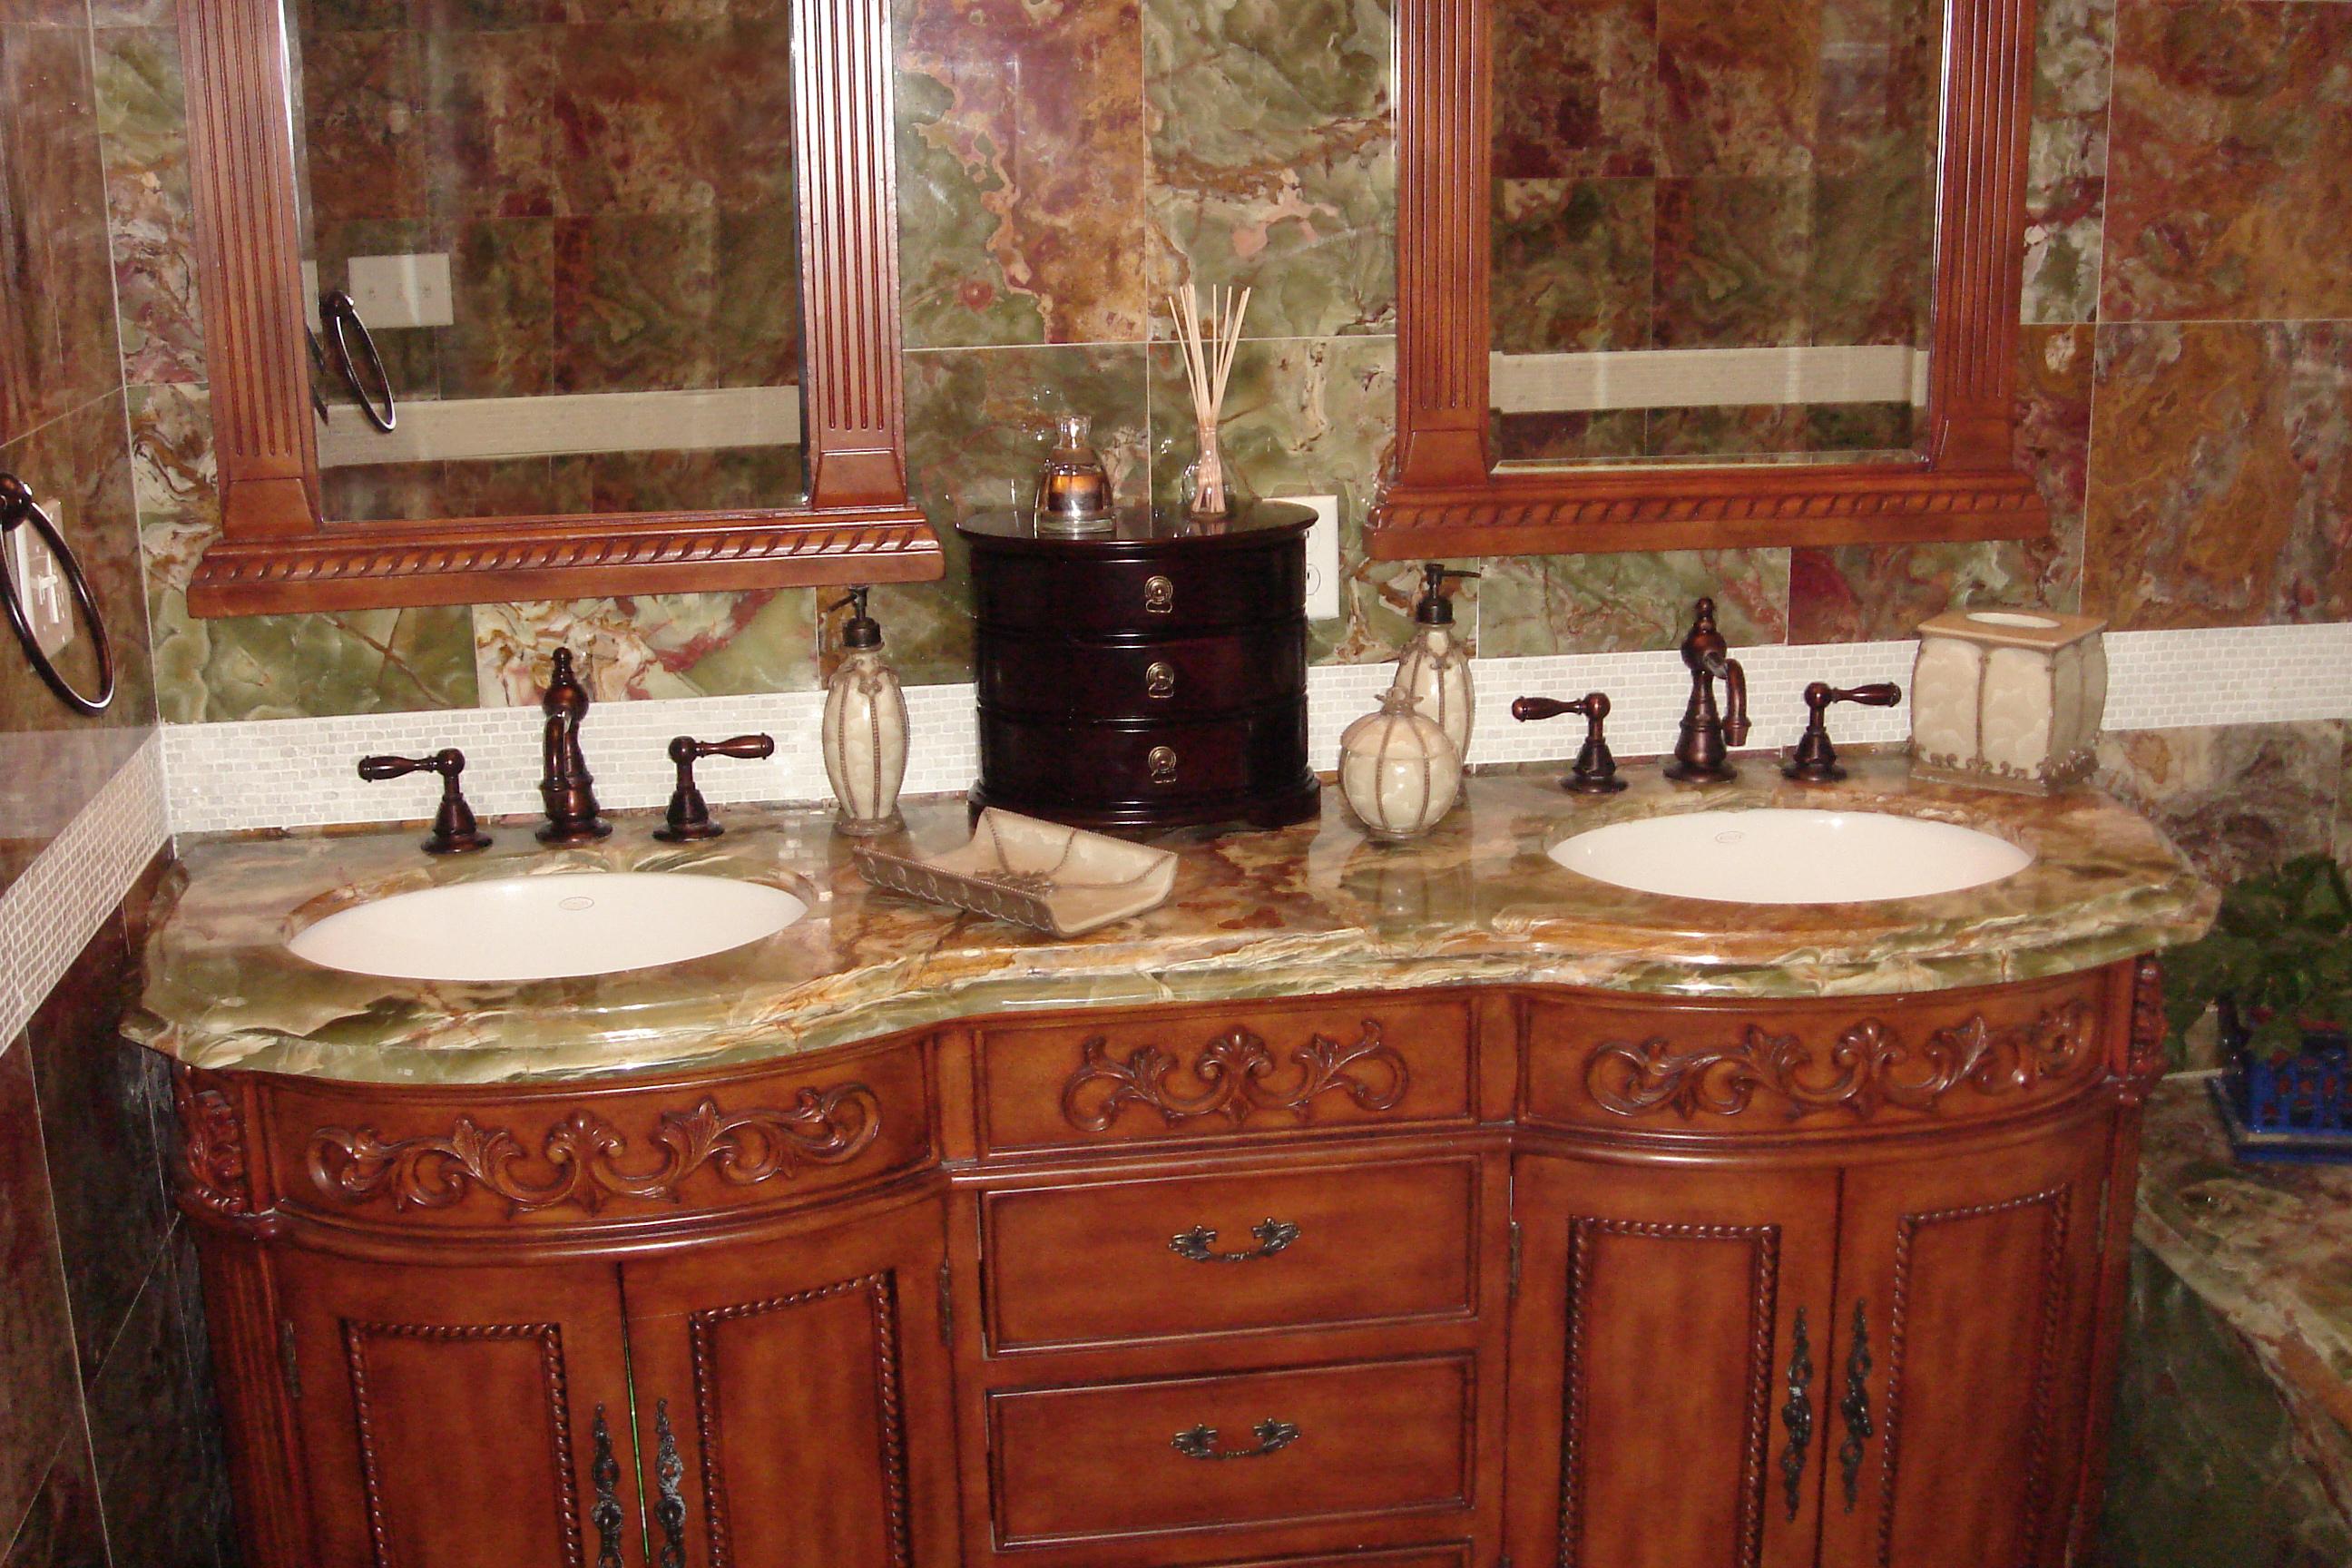 Magnificent Calming Bathroom Paint Colors Huge Tile Backsplash In Bathroom Pictures Regular Master Bath Remodel Plans Shabby Chic Bath Shelves Old Hampton Bay Bath Lighting Fixtures SoftHome Depot Bathroom Images Granite Countertops In Bergen County NJ Marble And Granite Expo ..